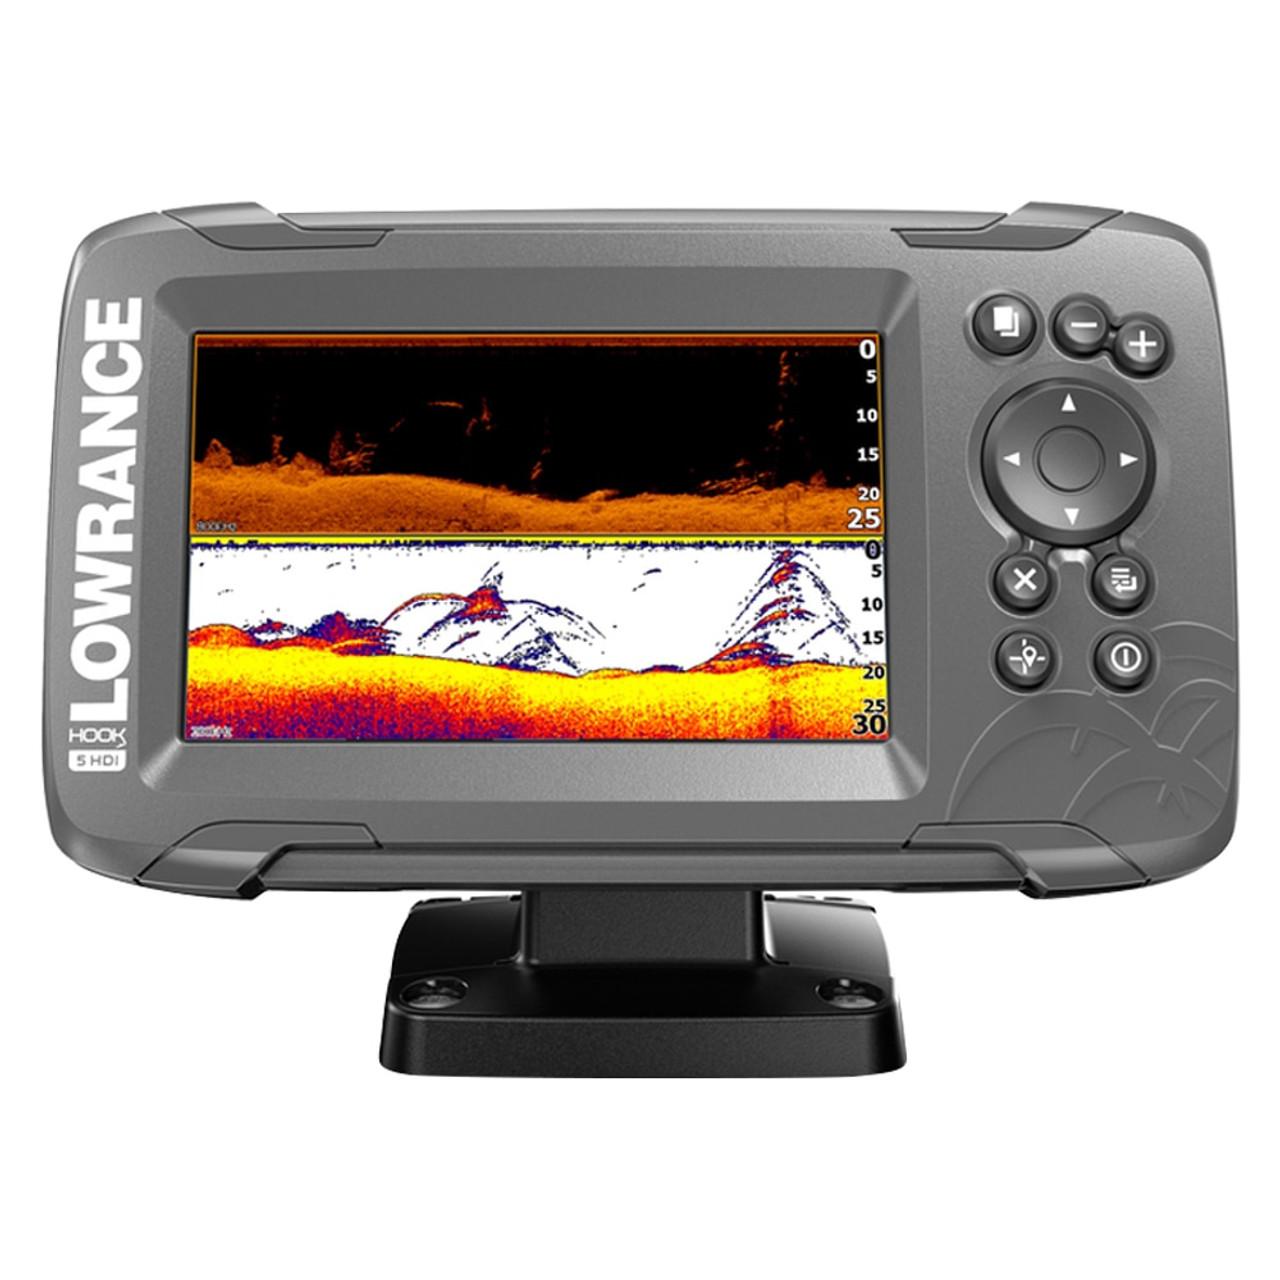 Lowrance Hook 2 4X Depth Sounder Fish Finder /& Transducer